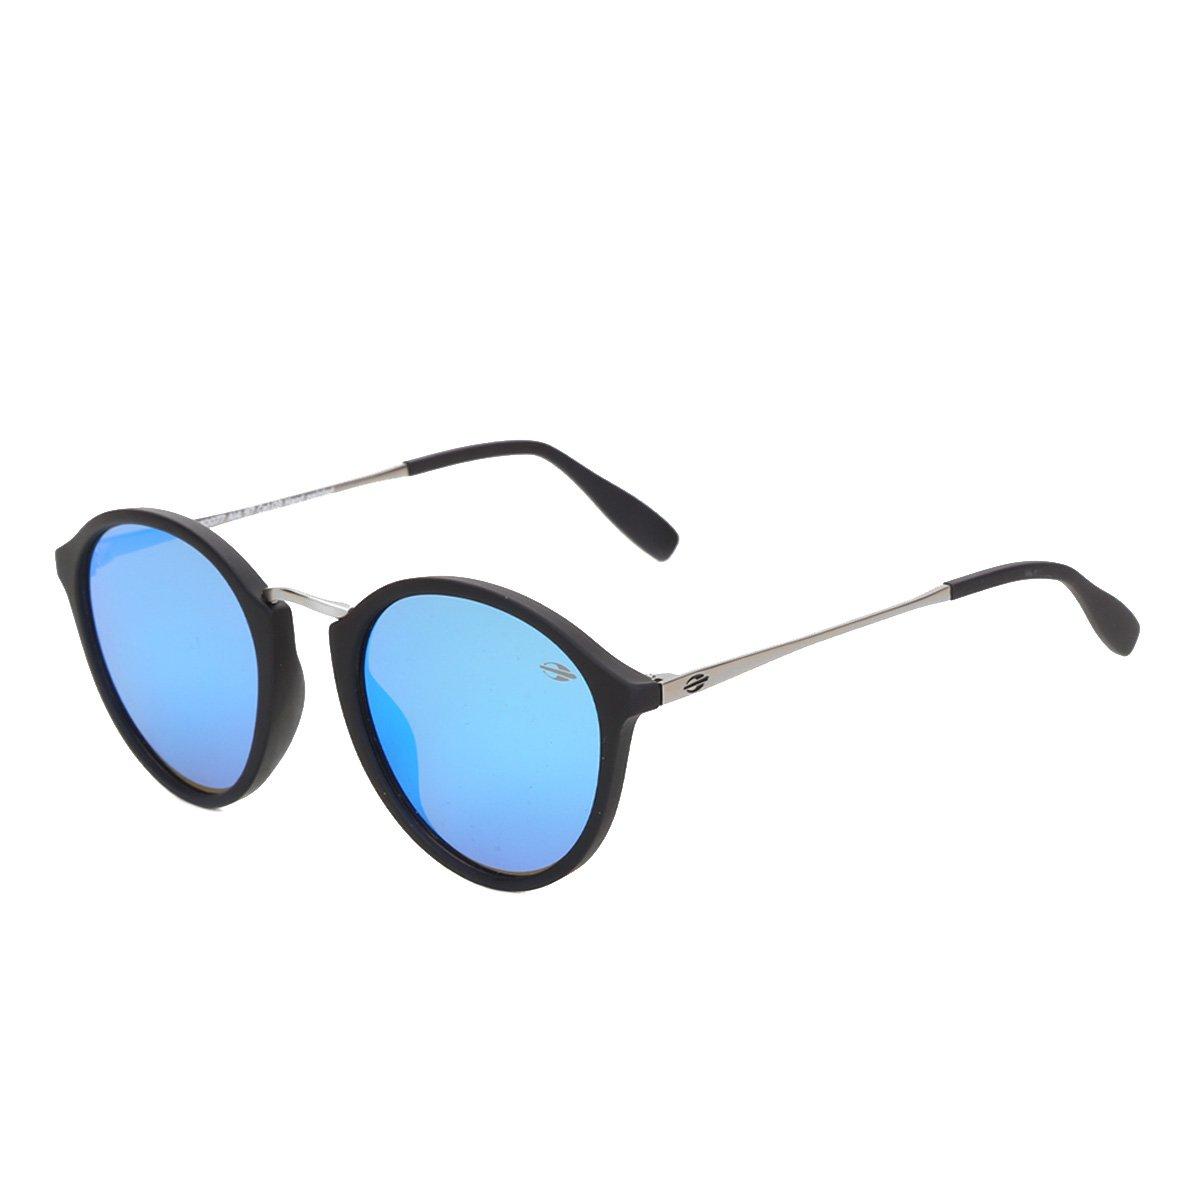 Óculos De Sol Mormaii Cali Preto Fosco Lente Revo Azul